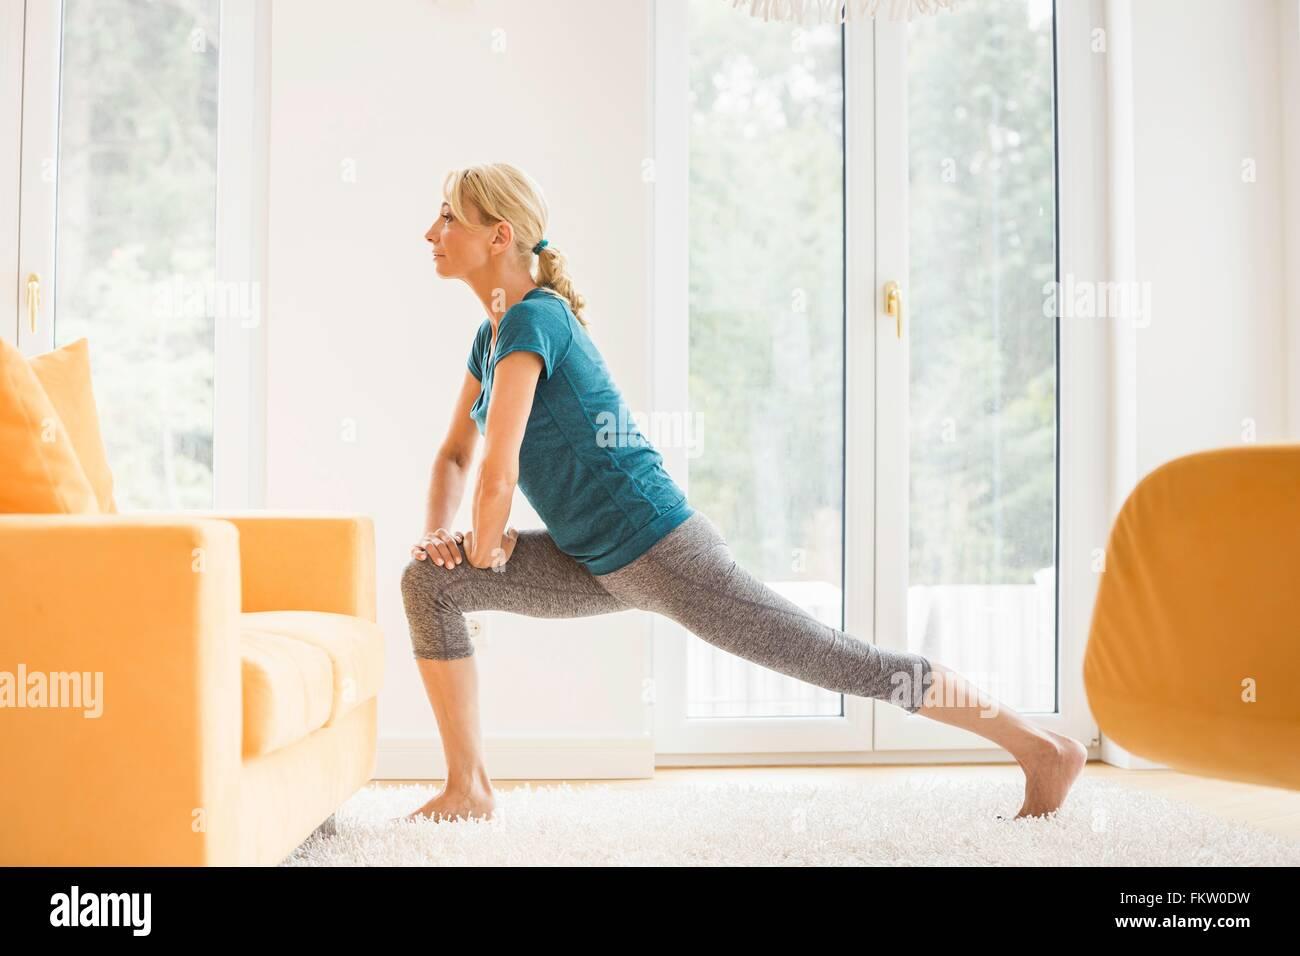 Reife Frau Longe Stretch trainieren im Wohnzimmer Stockfoto